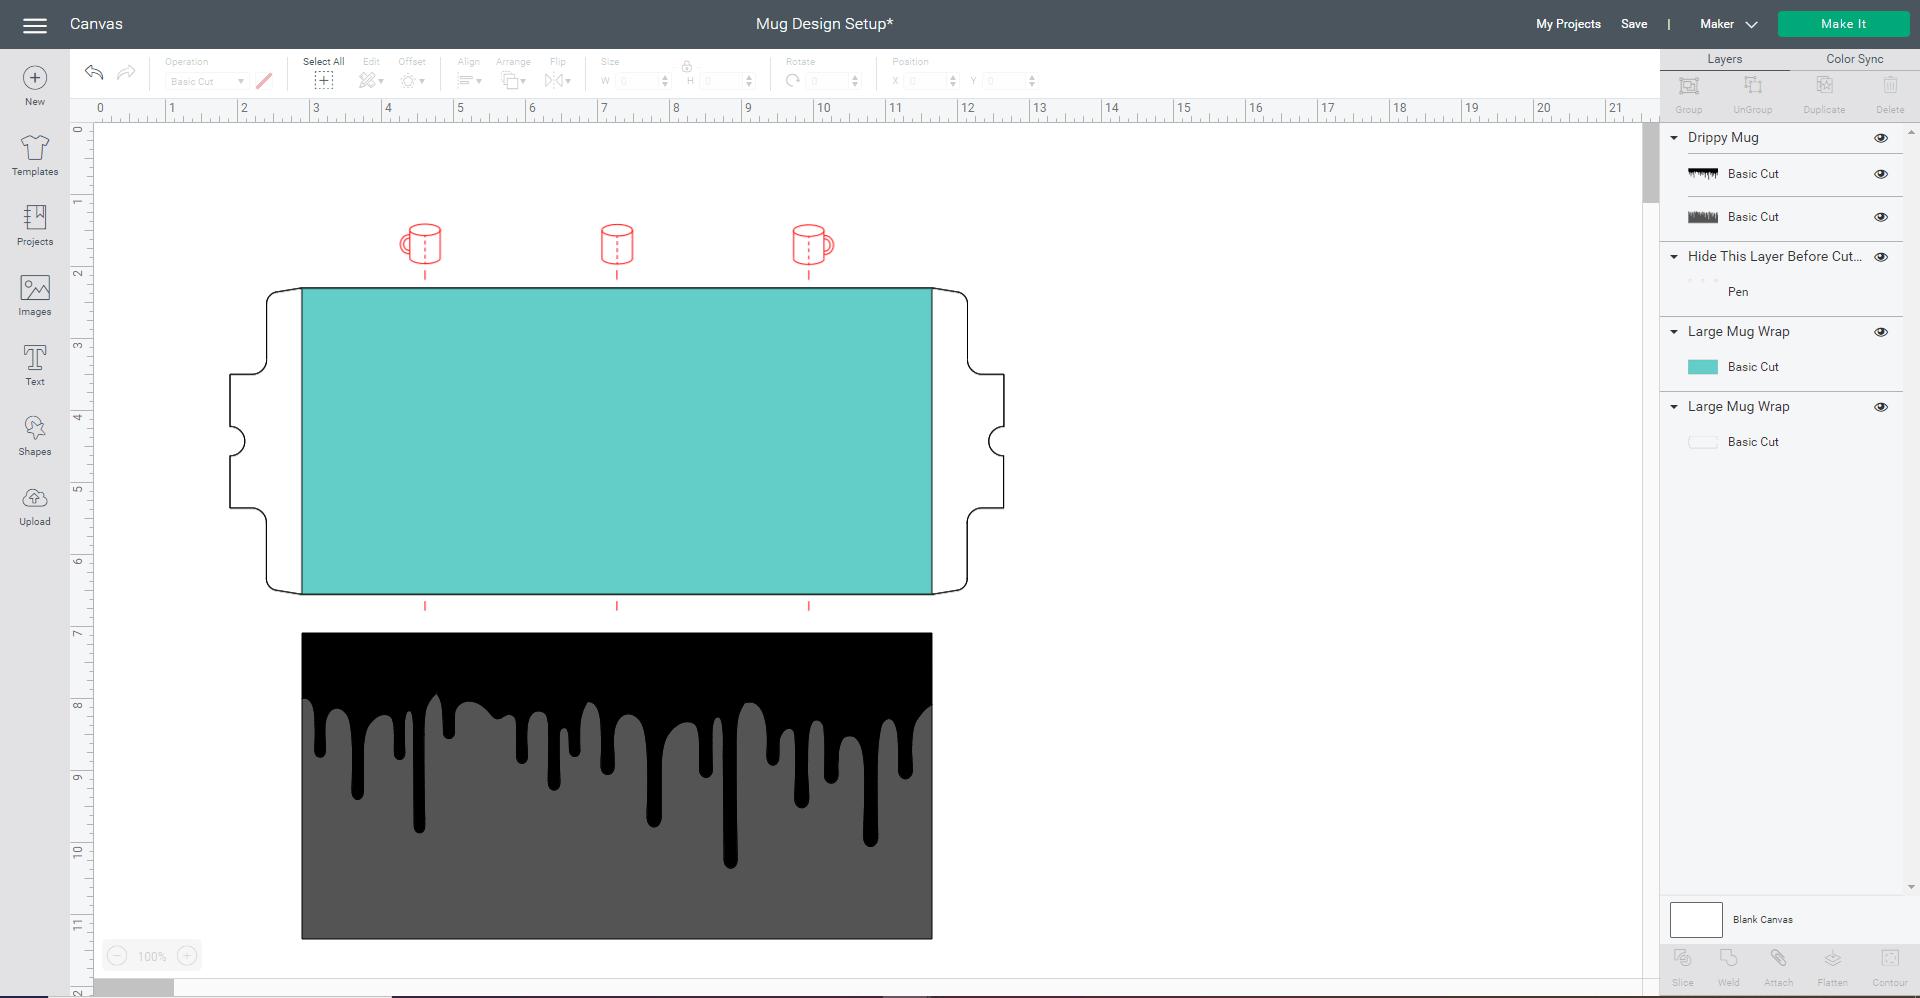 Cricut Design Space screenshot - uploading the file